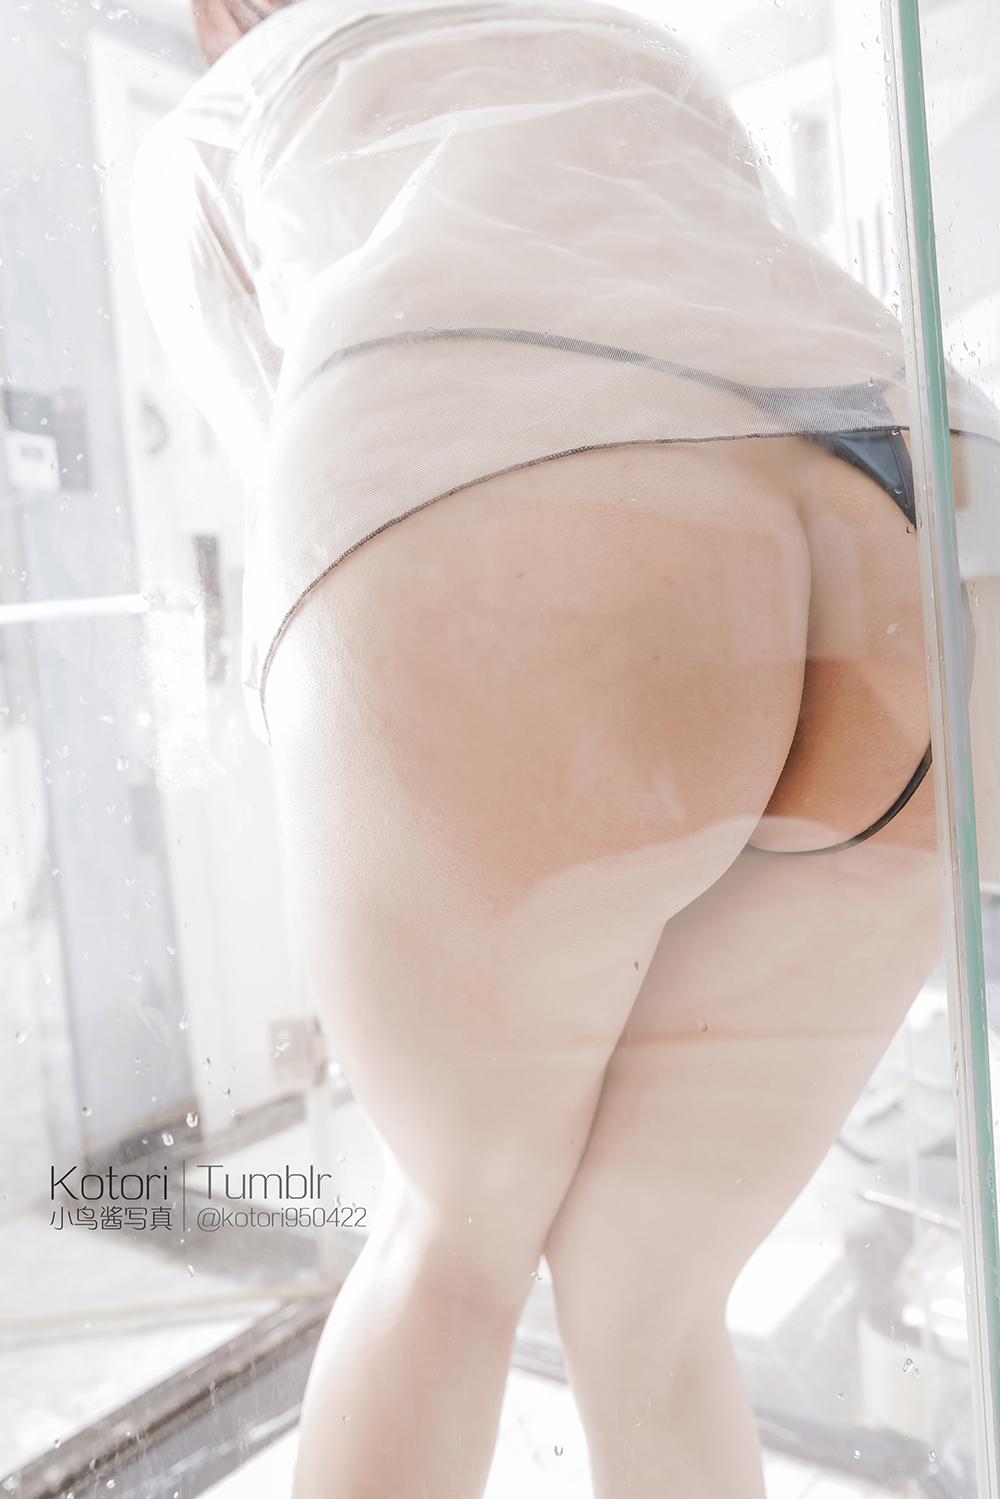 0lsNtF - Cosplay girl Tumblr PR社 福利姬 小鸟酱 透明薄纱装